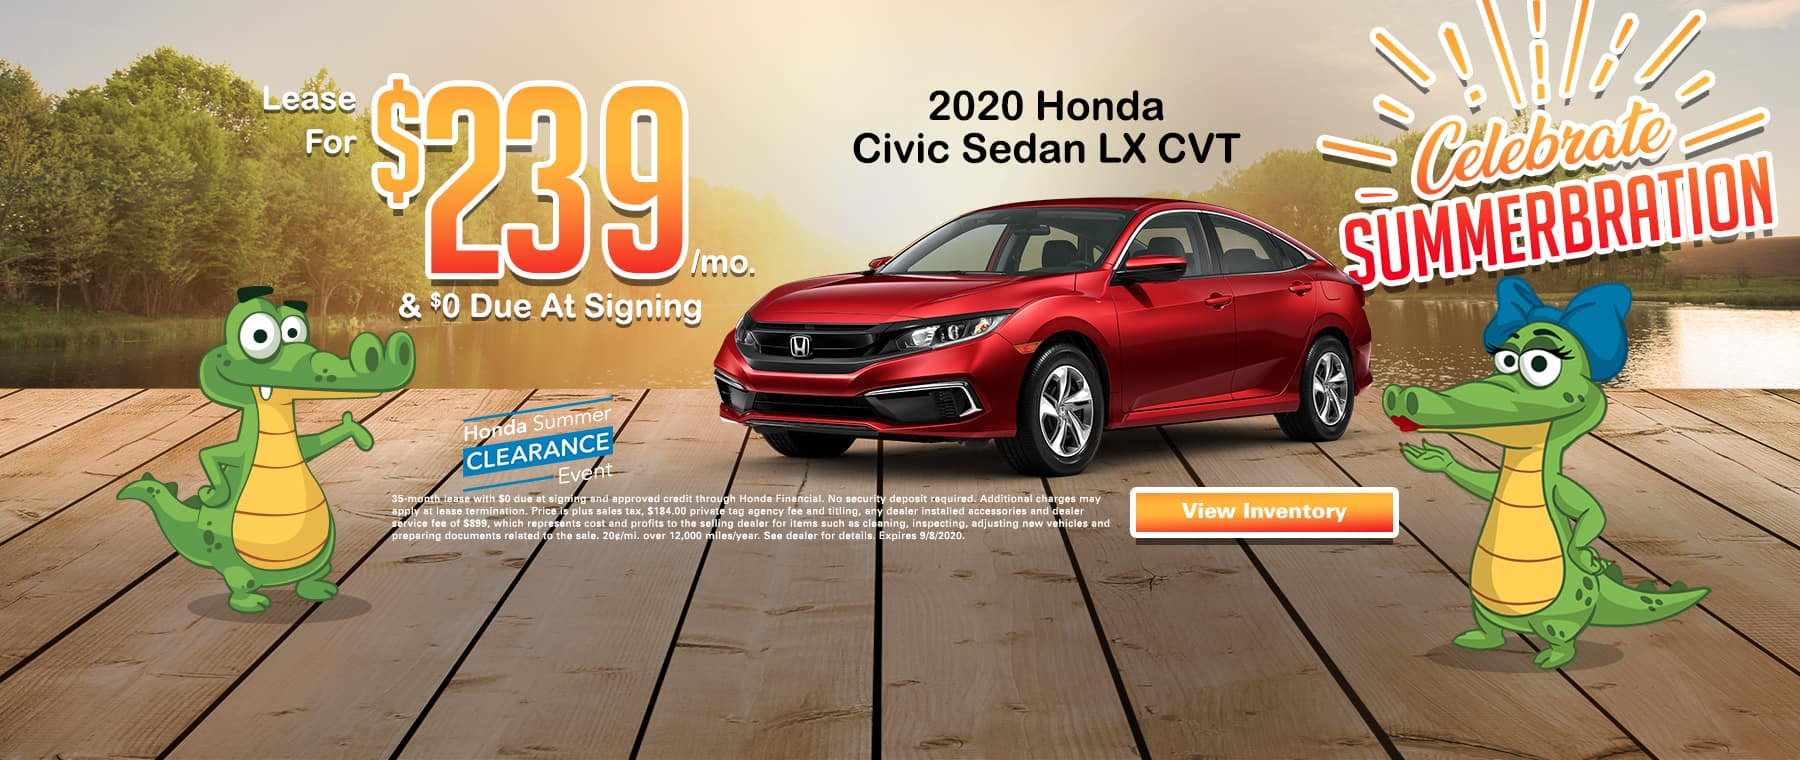 New 2020 Honda Civic Sedan LX CVT | Lease For $239 Per Mo | $0 Due At Signing | Celebrate Summerbration | Honda Summer Clearance Event